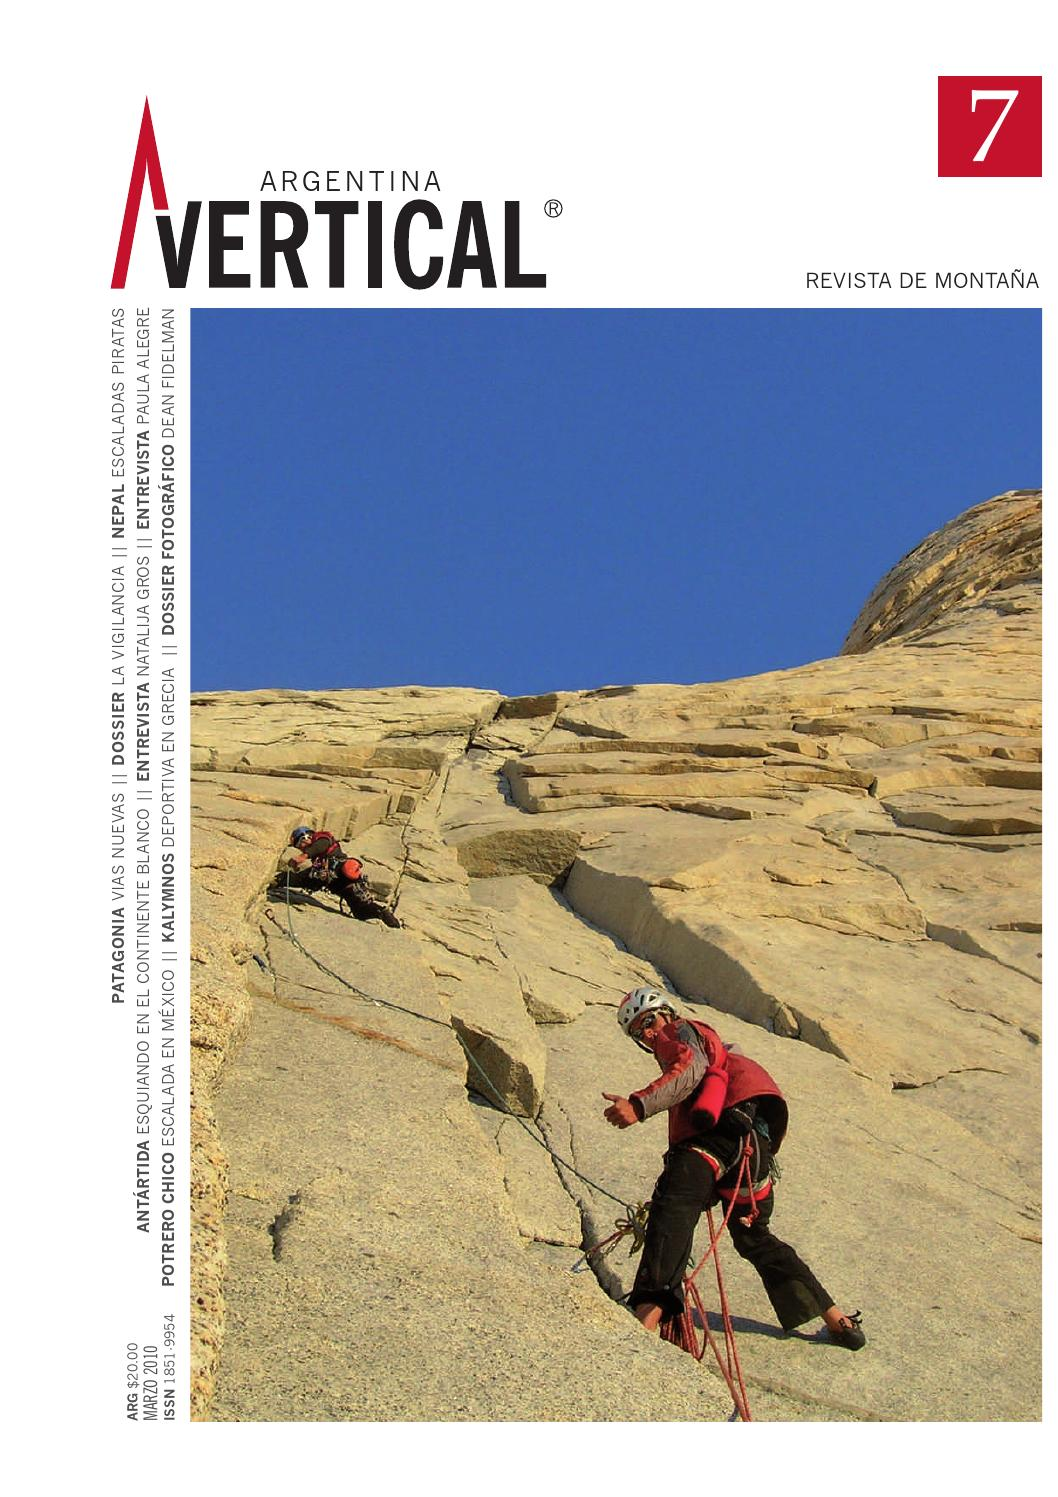 1aea63bcb Vertical #7 Completa Digital by Vertical Argentina - Revista de Montaña -  issuu